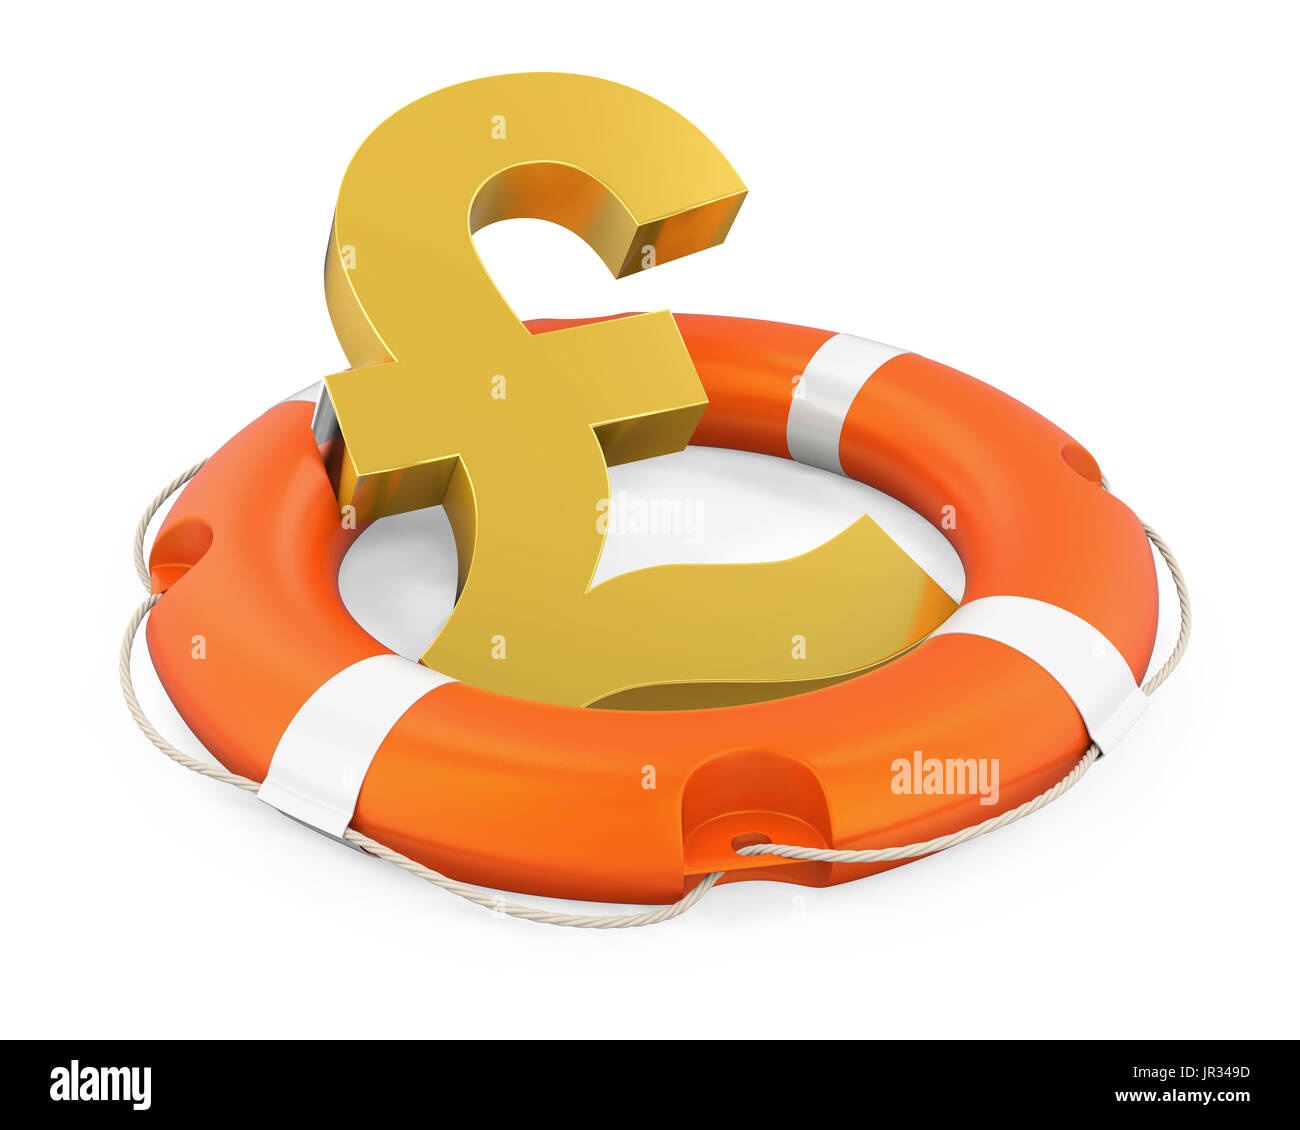 British Pound Sterling Symbol In Stock Photos British Pound